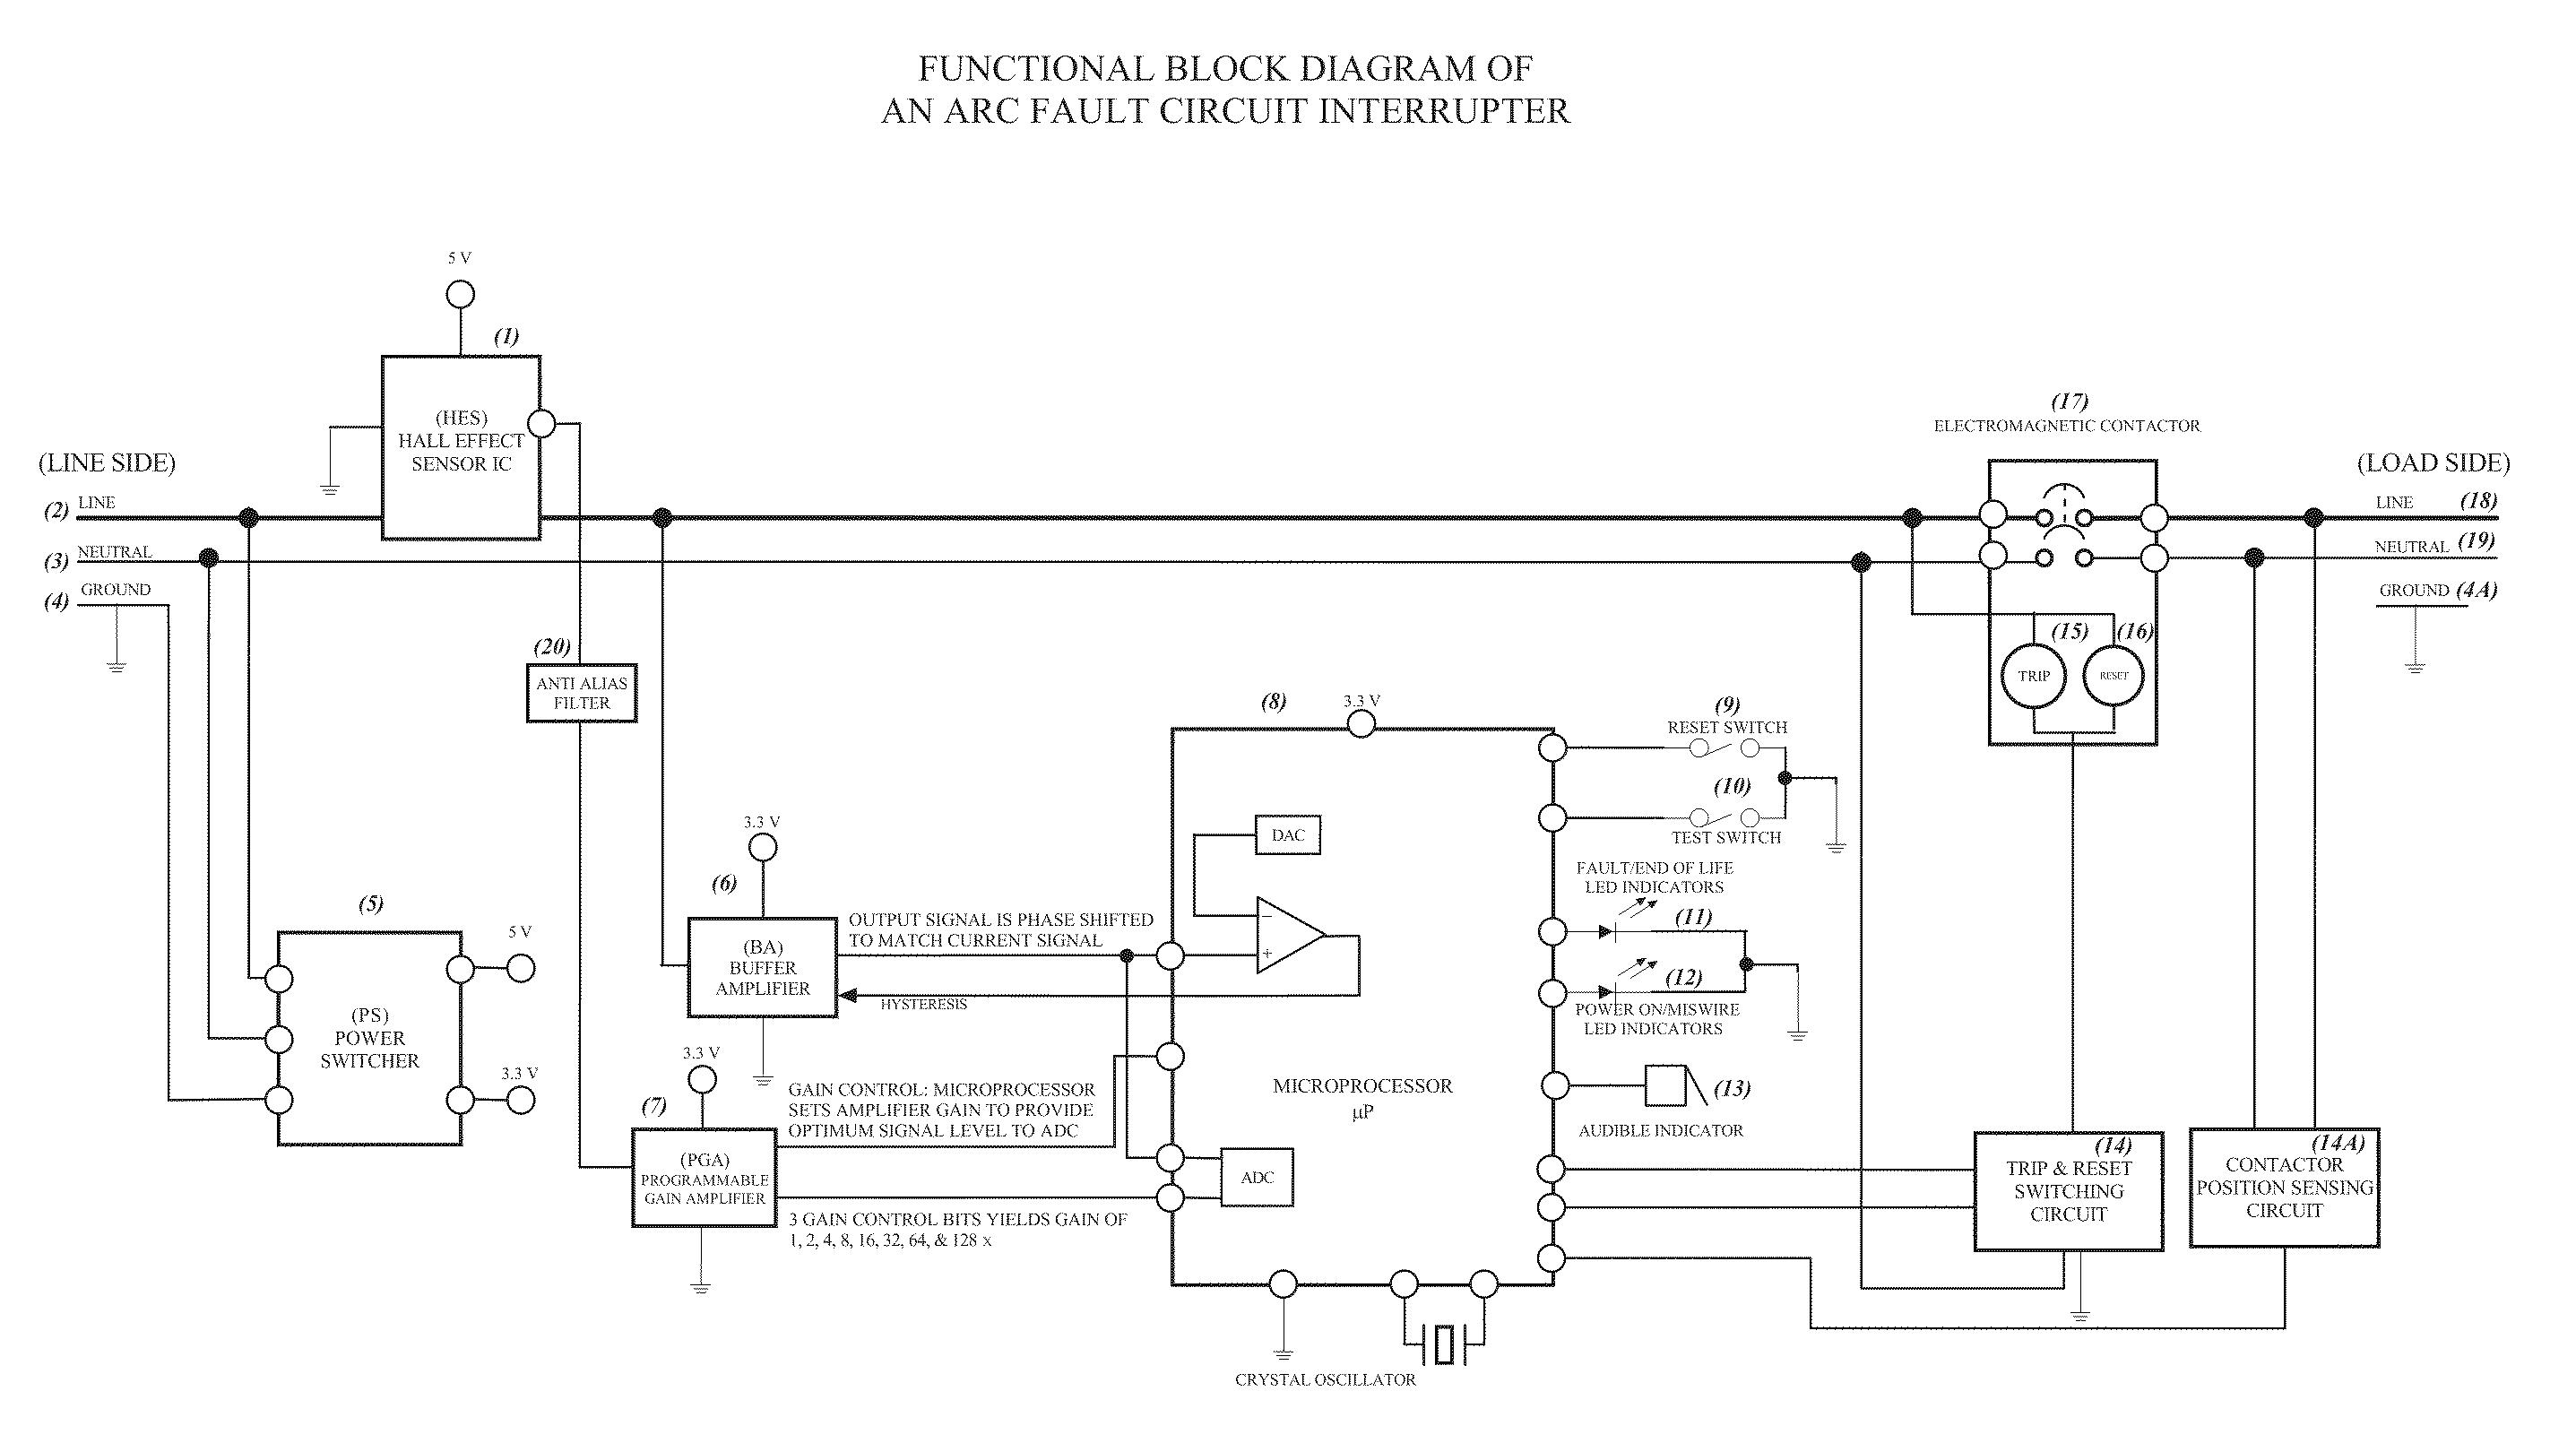 Afci Wiring Methods Diagrams Outlet Diagram Patent Us20100097733 Arc Fault Circuit Interrupter Breaker Square D